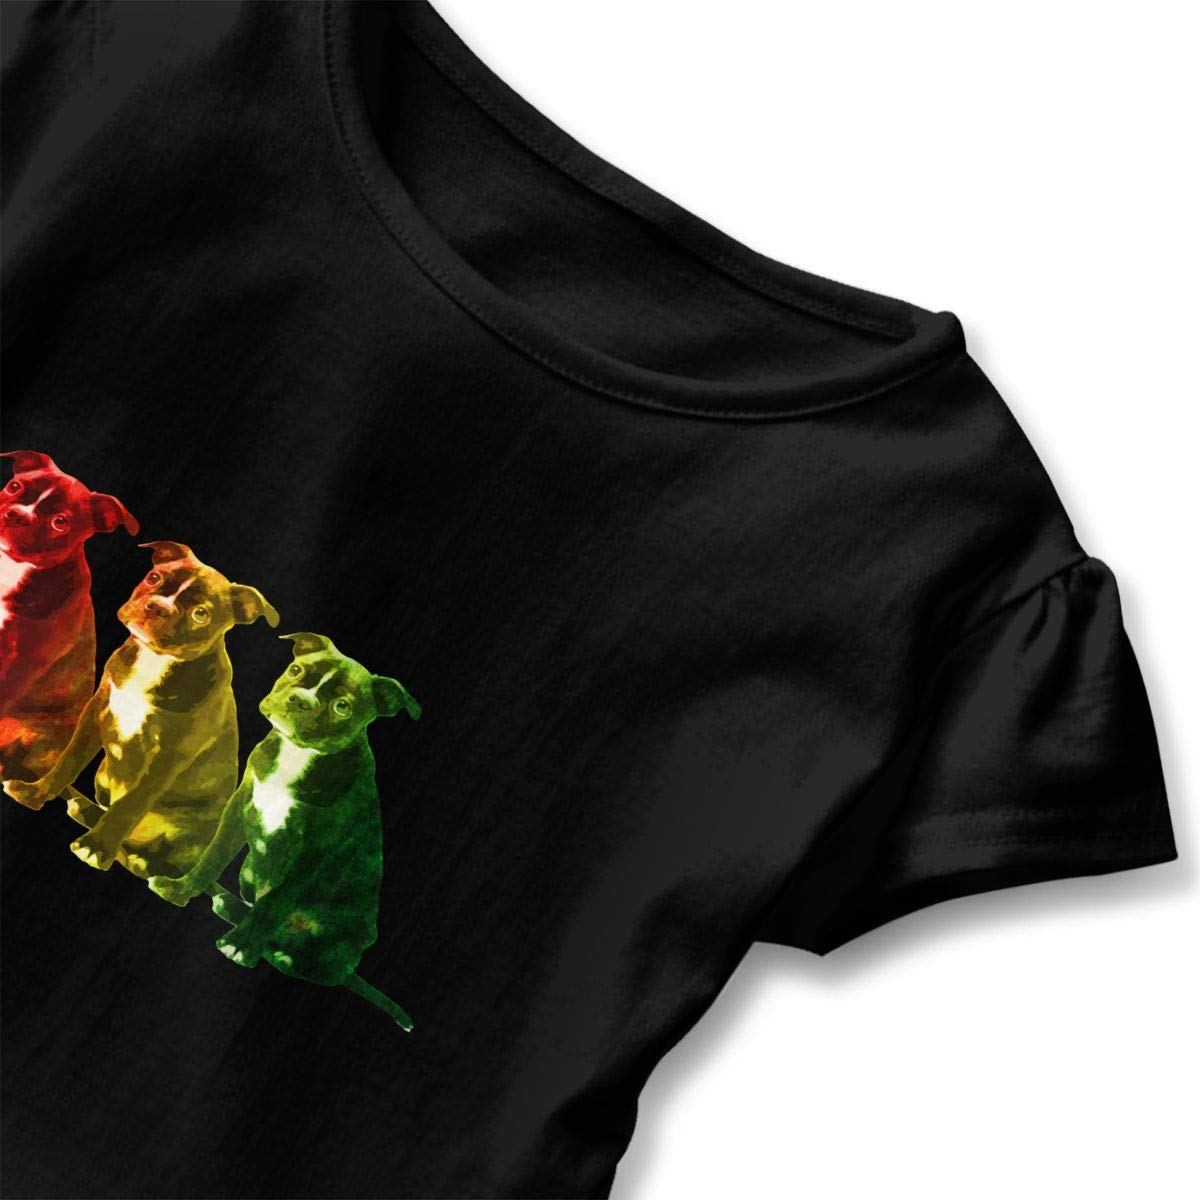 CZnuen Rasta Boston Terrier 2-6T Baby Girls Cotton Jersey Short Sleeve Ruffle Tee